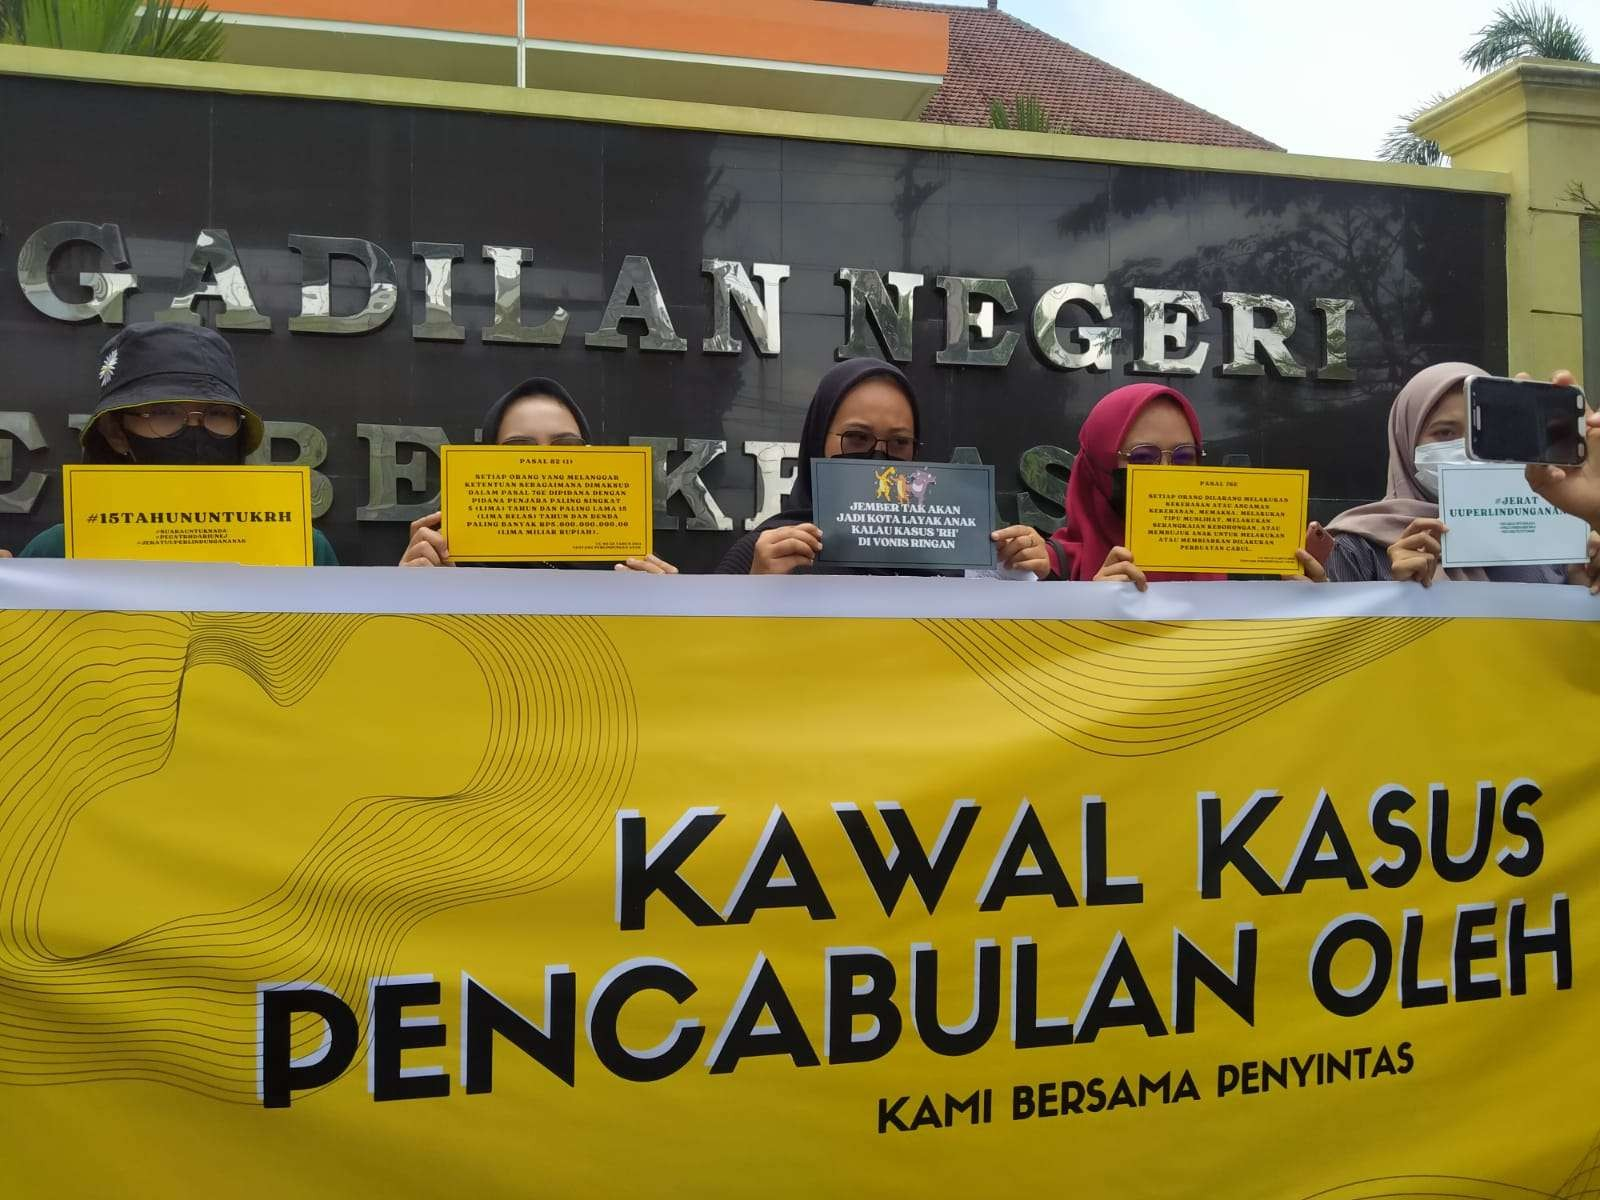 Aktivis Koalisi Tolak Kekerasan Seksual Jember menggelar aksi di depan Pengadilan Negeri Jember, Jawa Timur. (Foto: Rusdi/Ngopibareng.id)